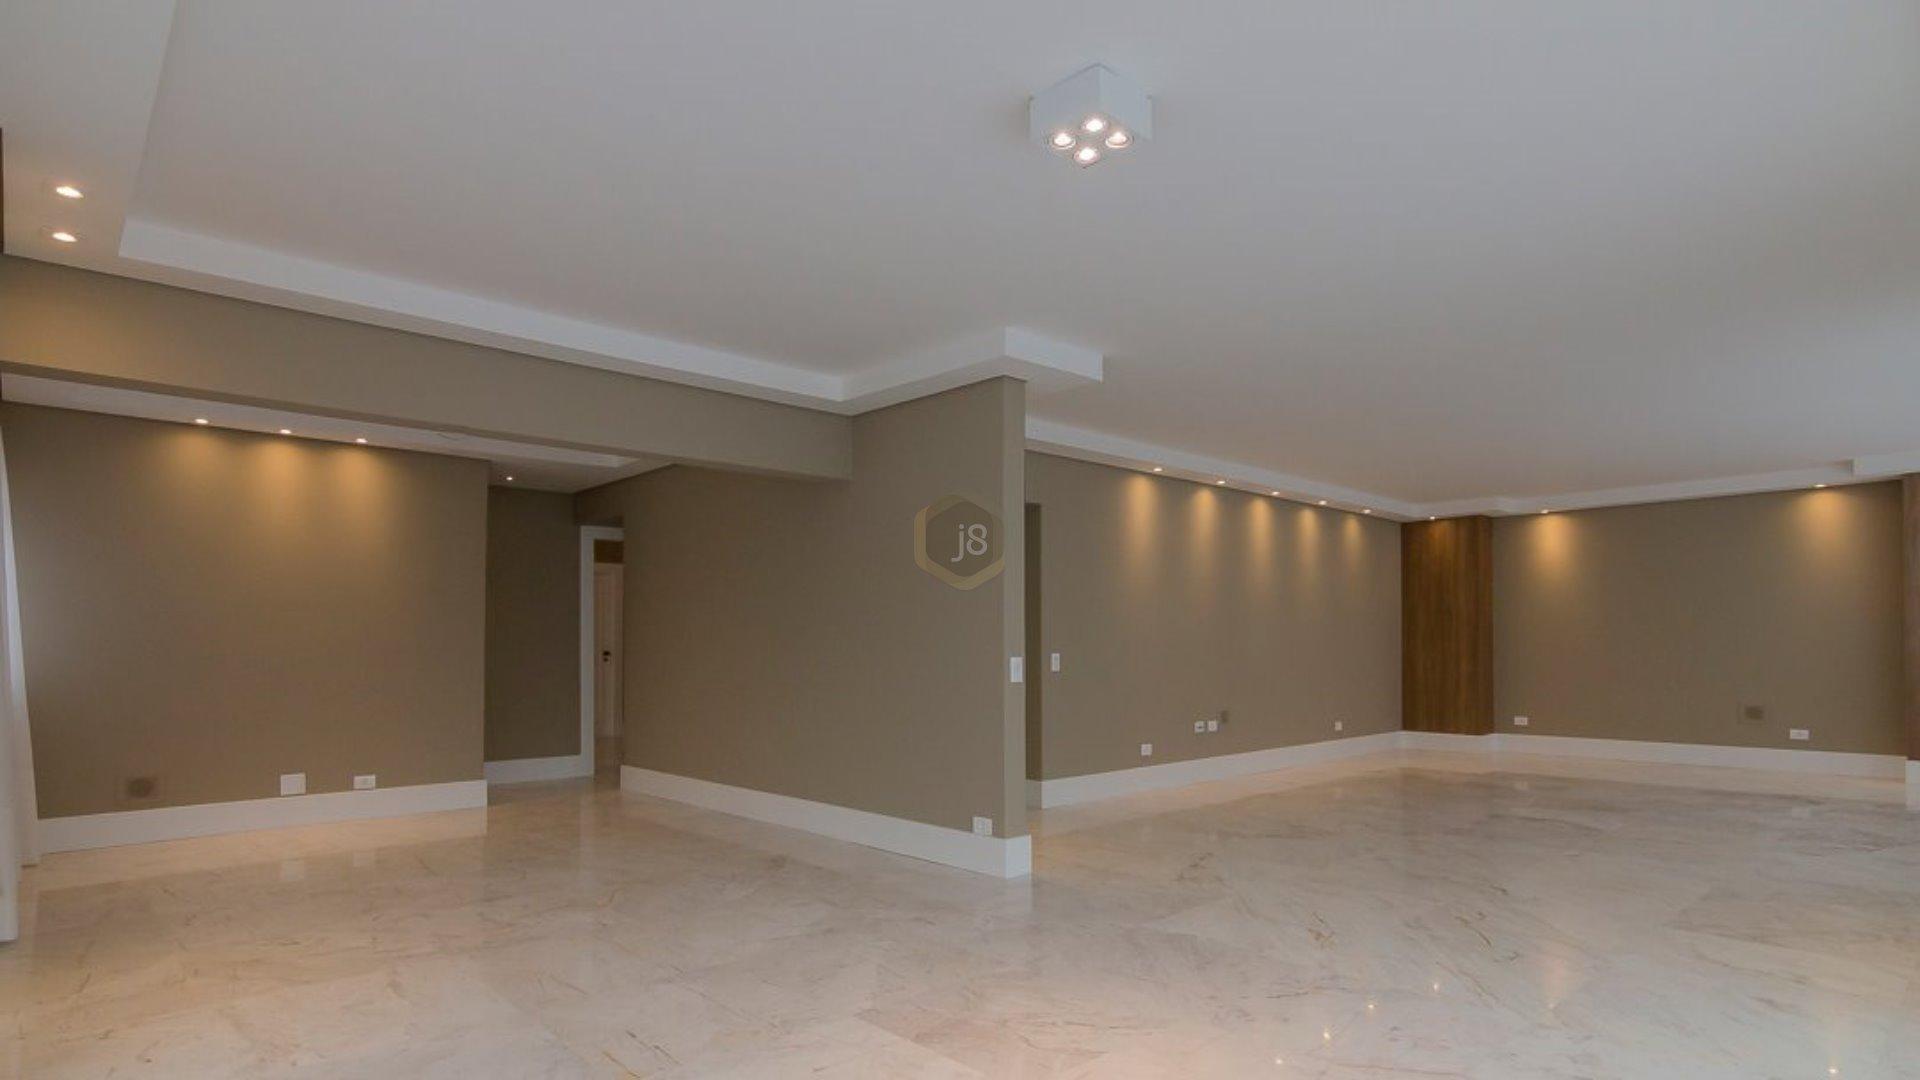 Foto de destaque Apartamento no batel pronto para  morar!